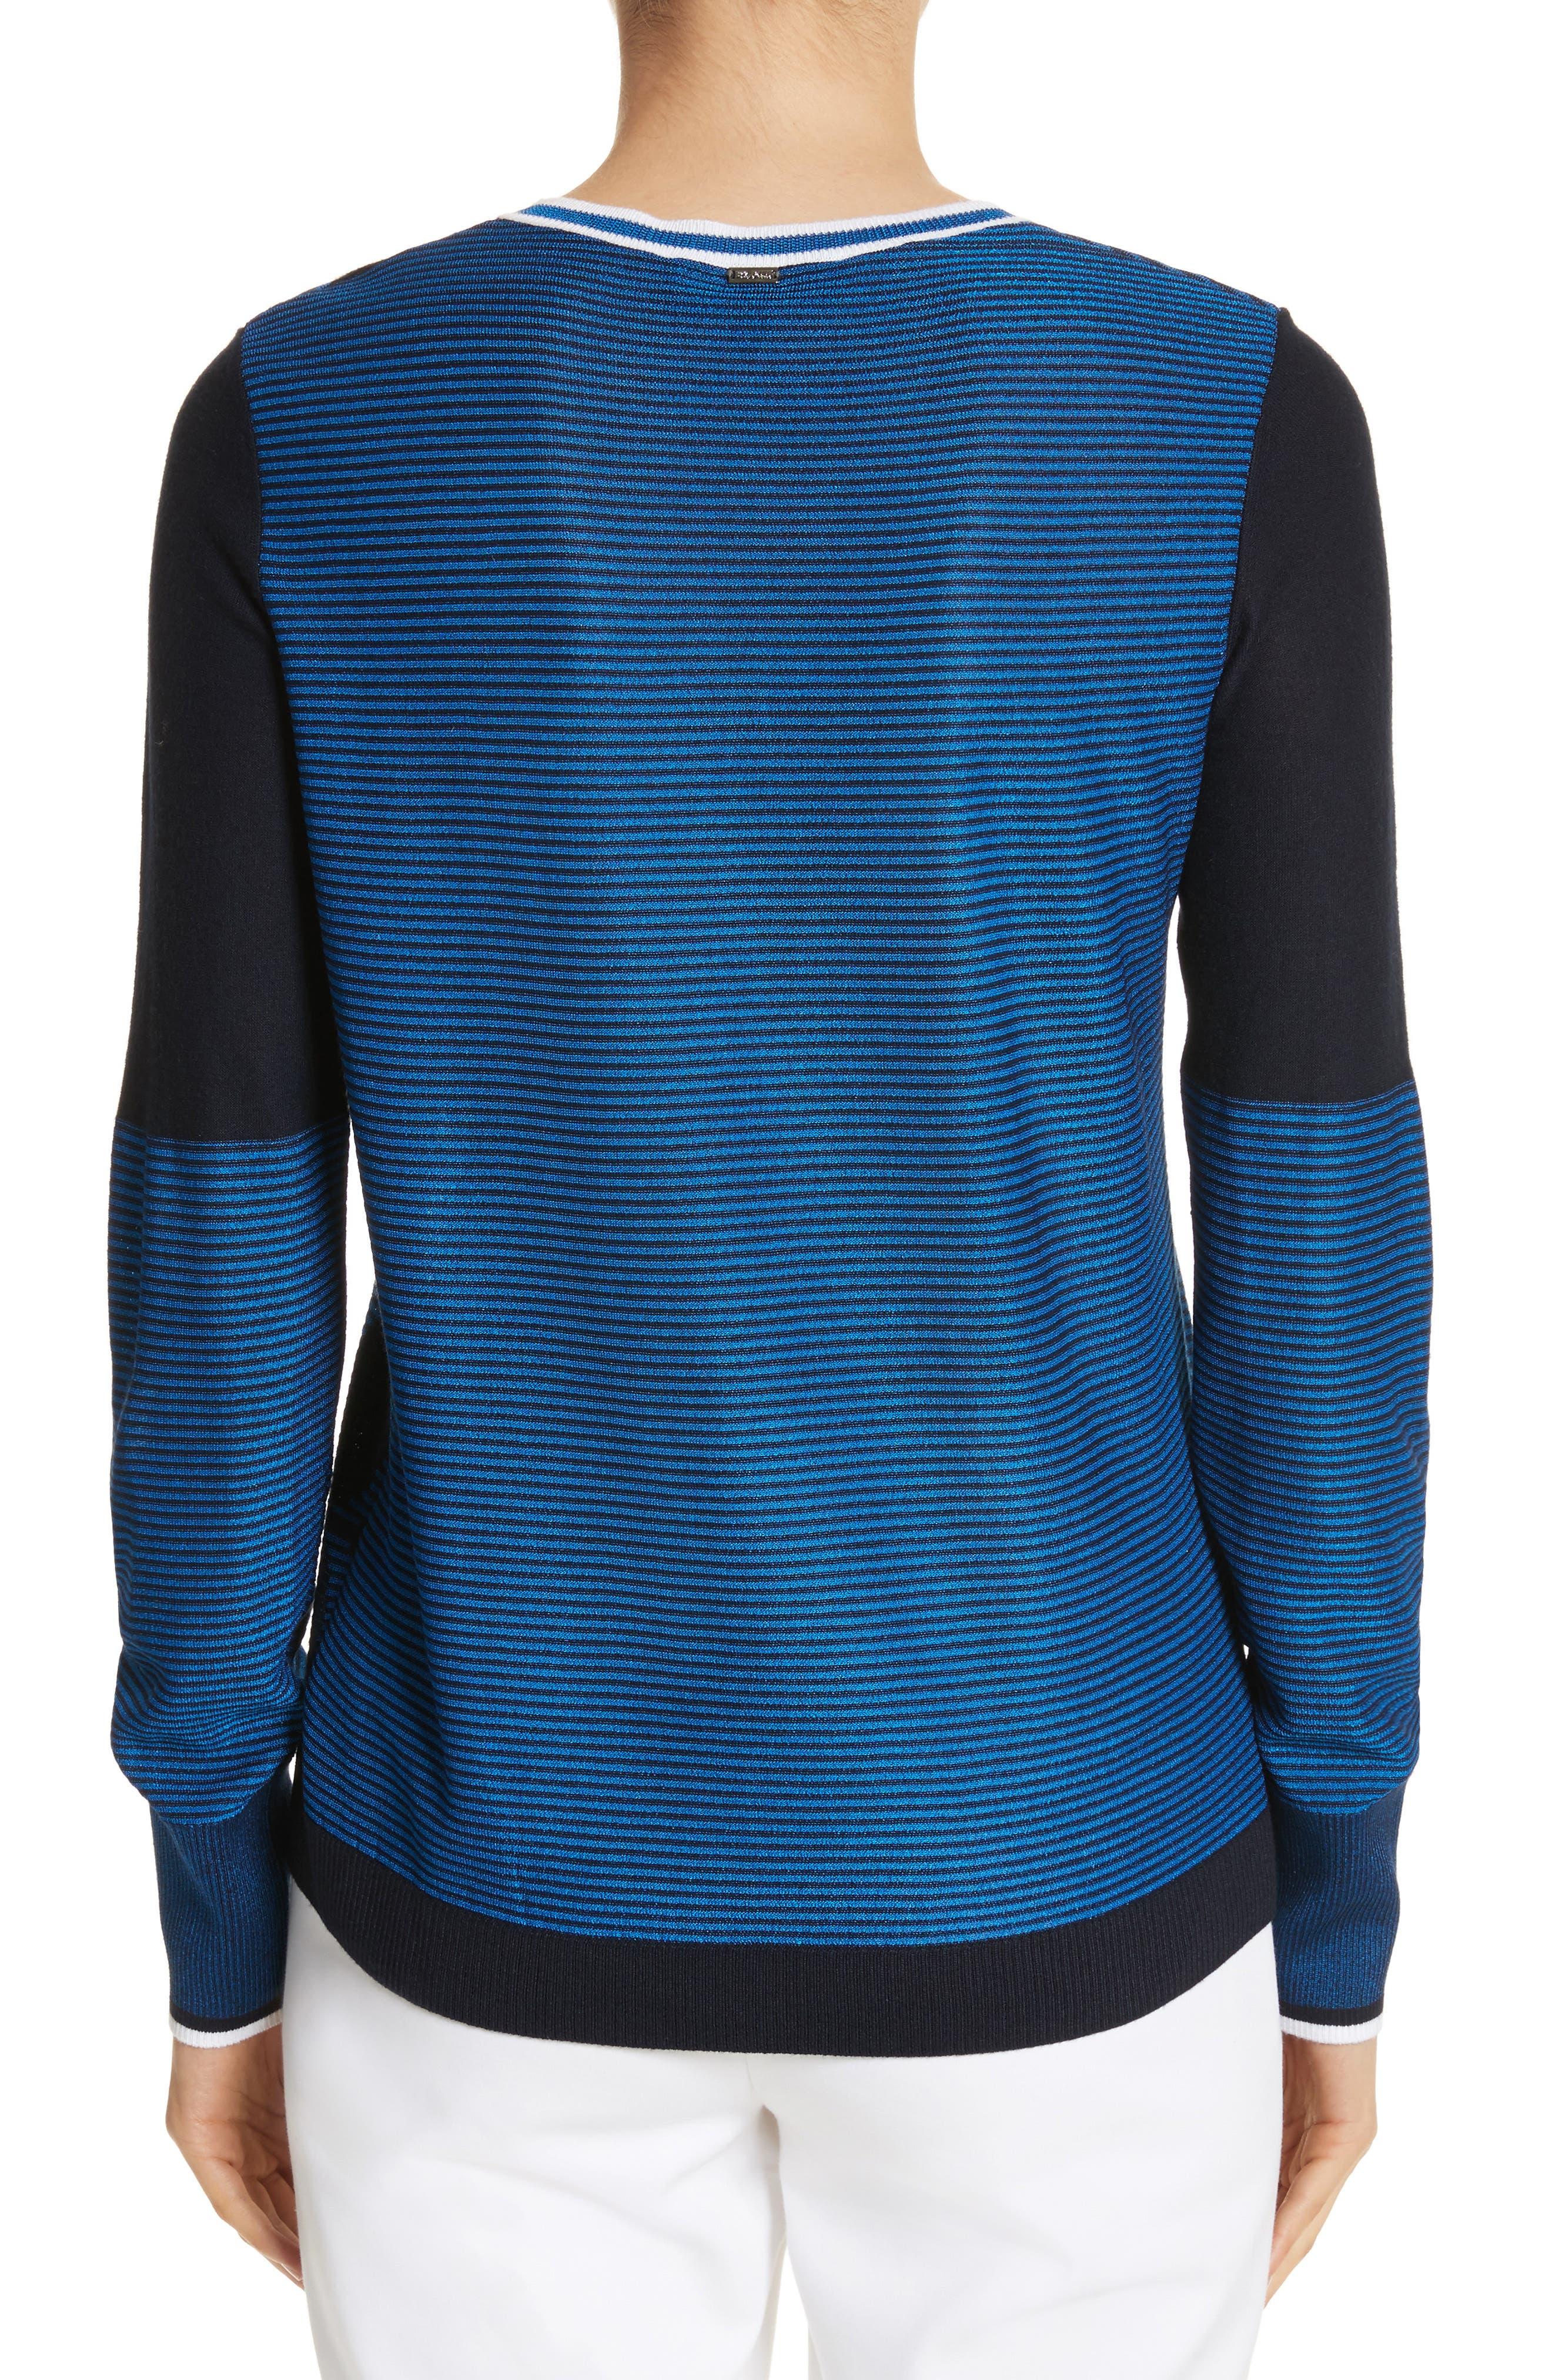 Jacquard Knit Sweater,                             Alternate thumbnail 2, color,                             Navy/ Niagara/ Bianco